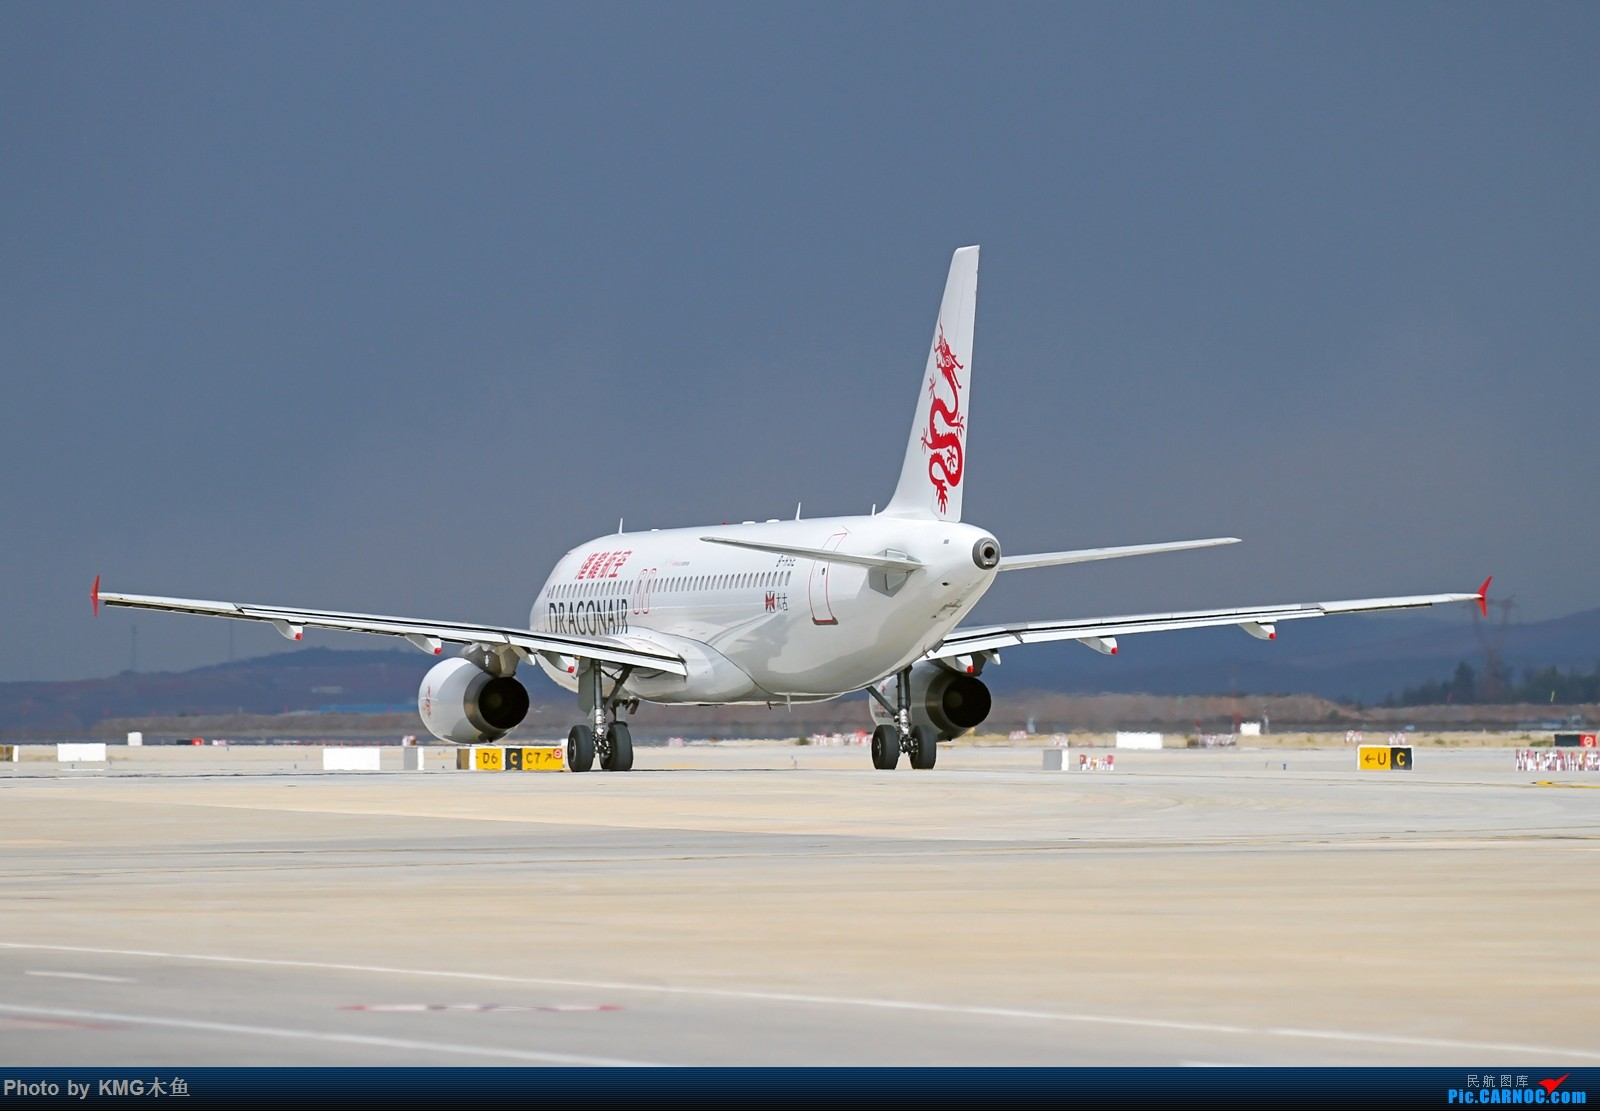 Re:[原创]【KMG昆明长水国际机场】昆明机场地面的精灵们 AIRBUS A320-200 B-HSE 中国昆明长水国际机场机场